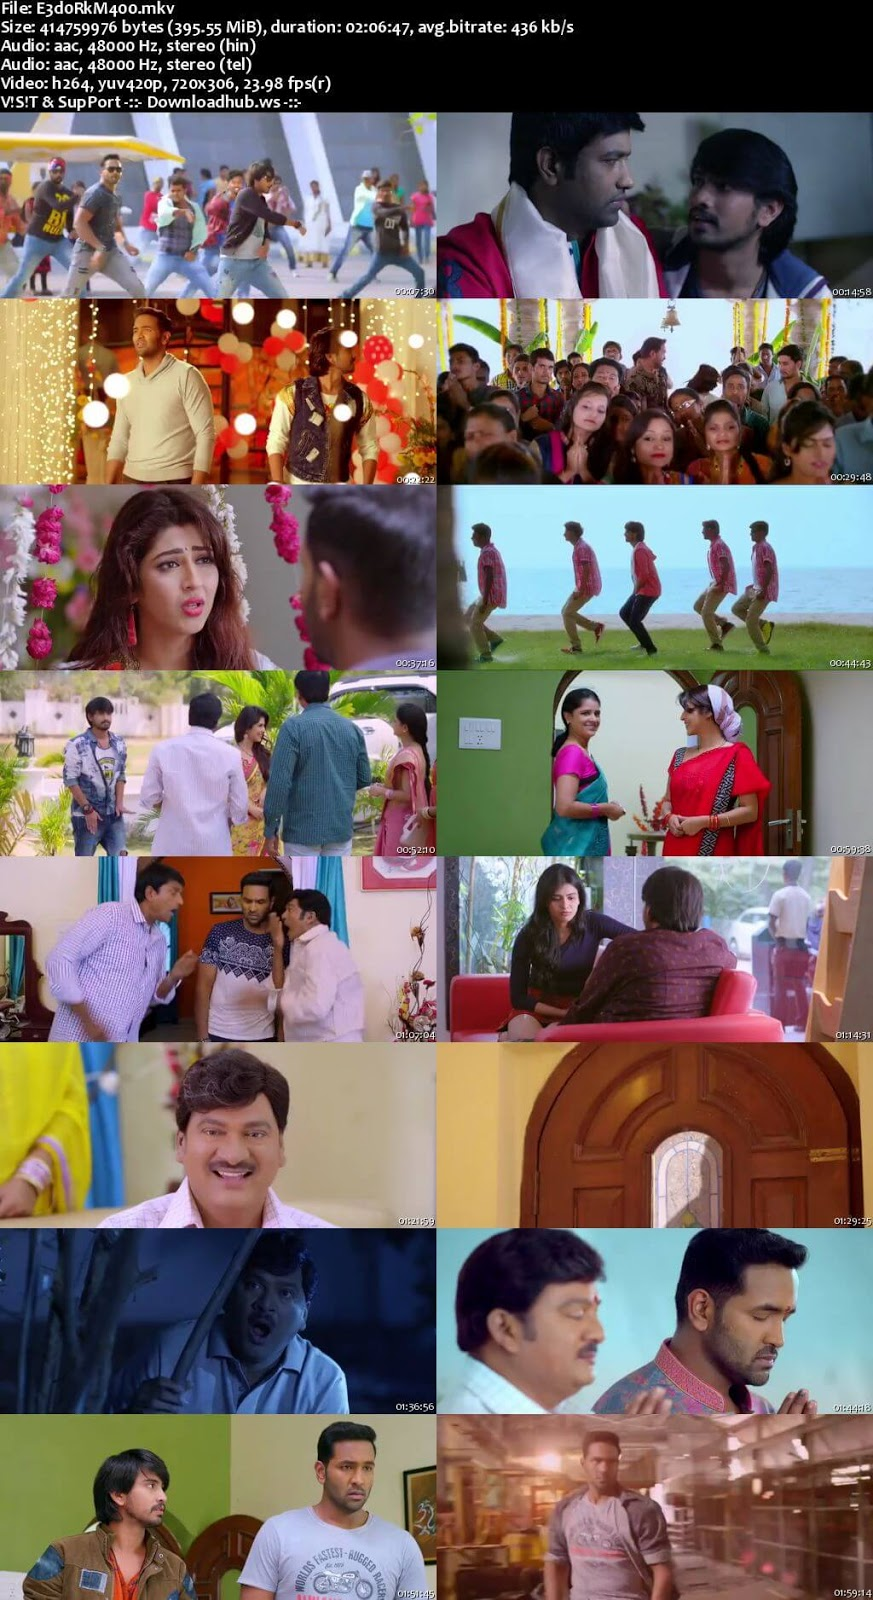 Eedo Rakam Aado Rakam 2016 UNCUT Hindi Dual Audio 480p HDRip Free Download